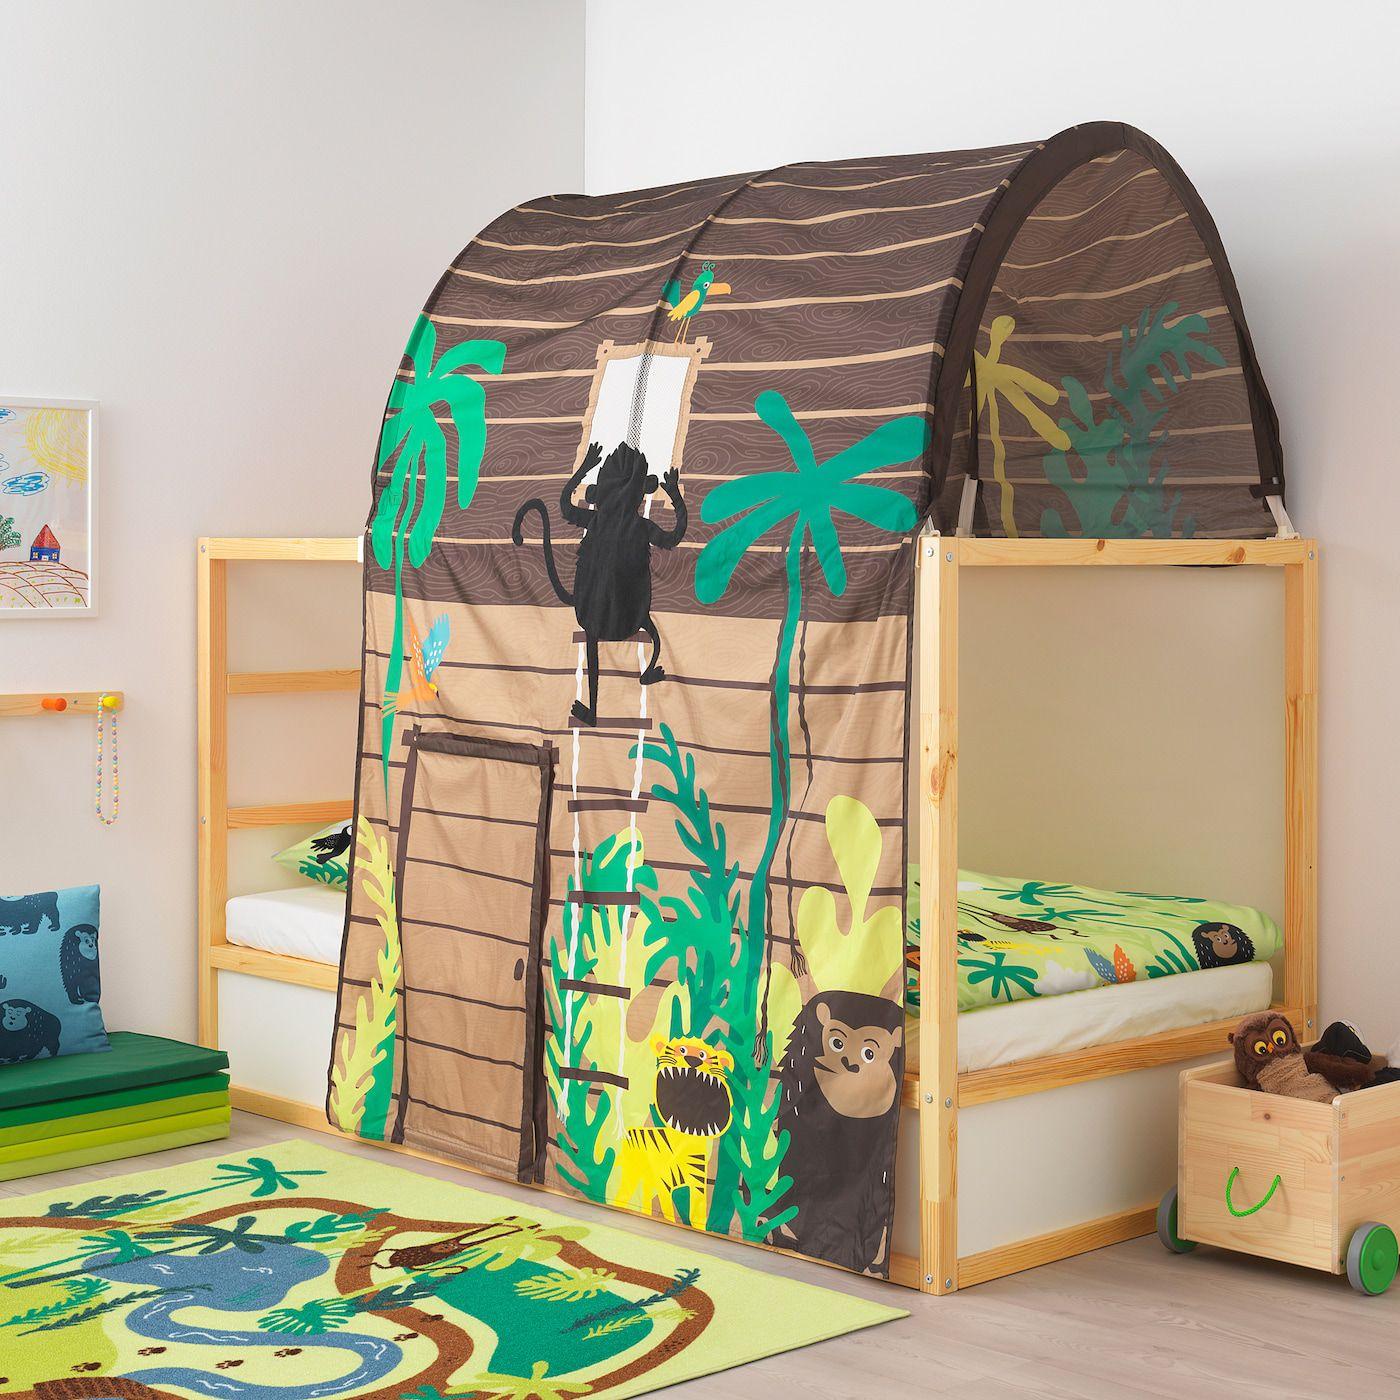 Ikea Kura The World S Most Versatile Toddler Bed